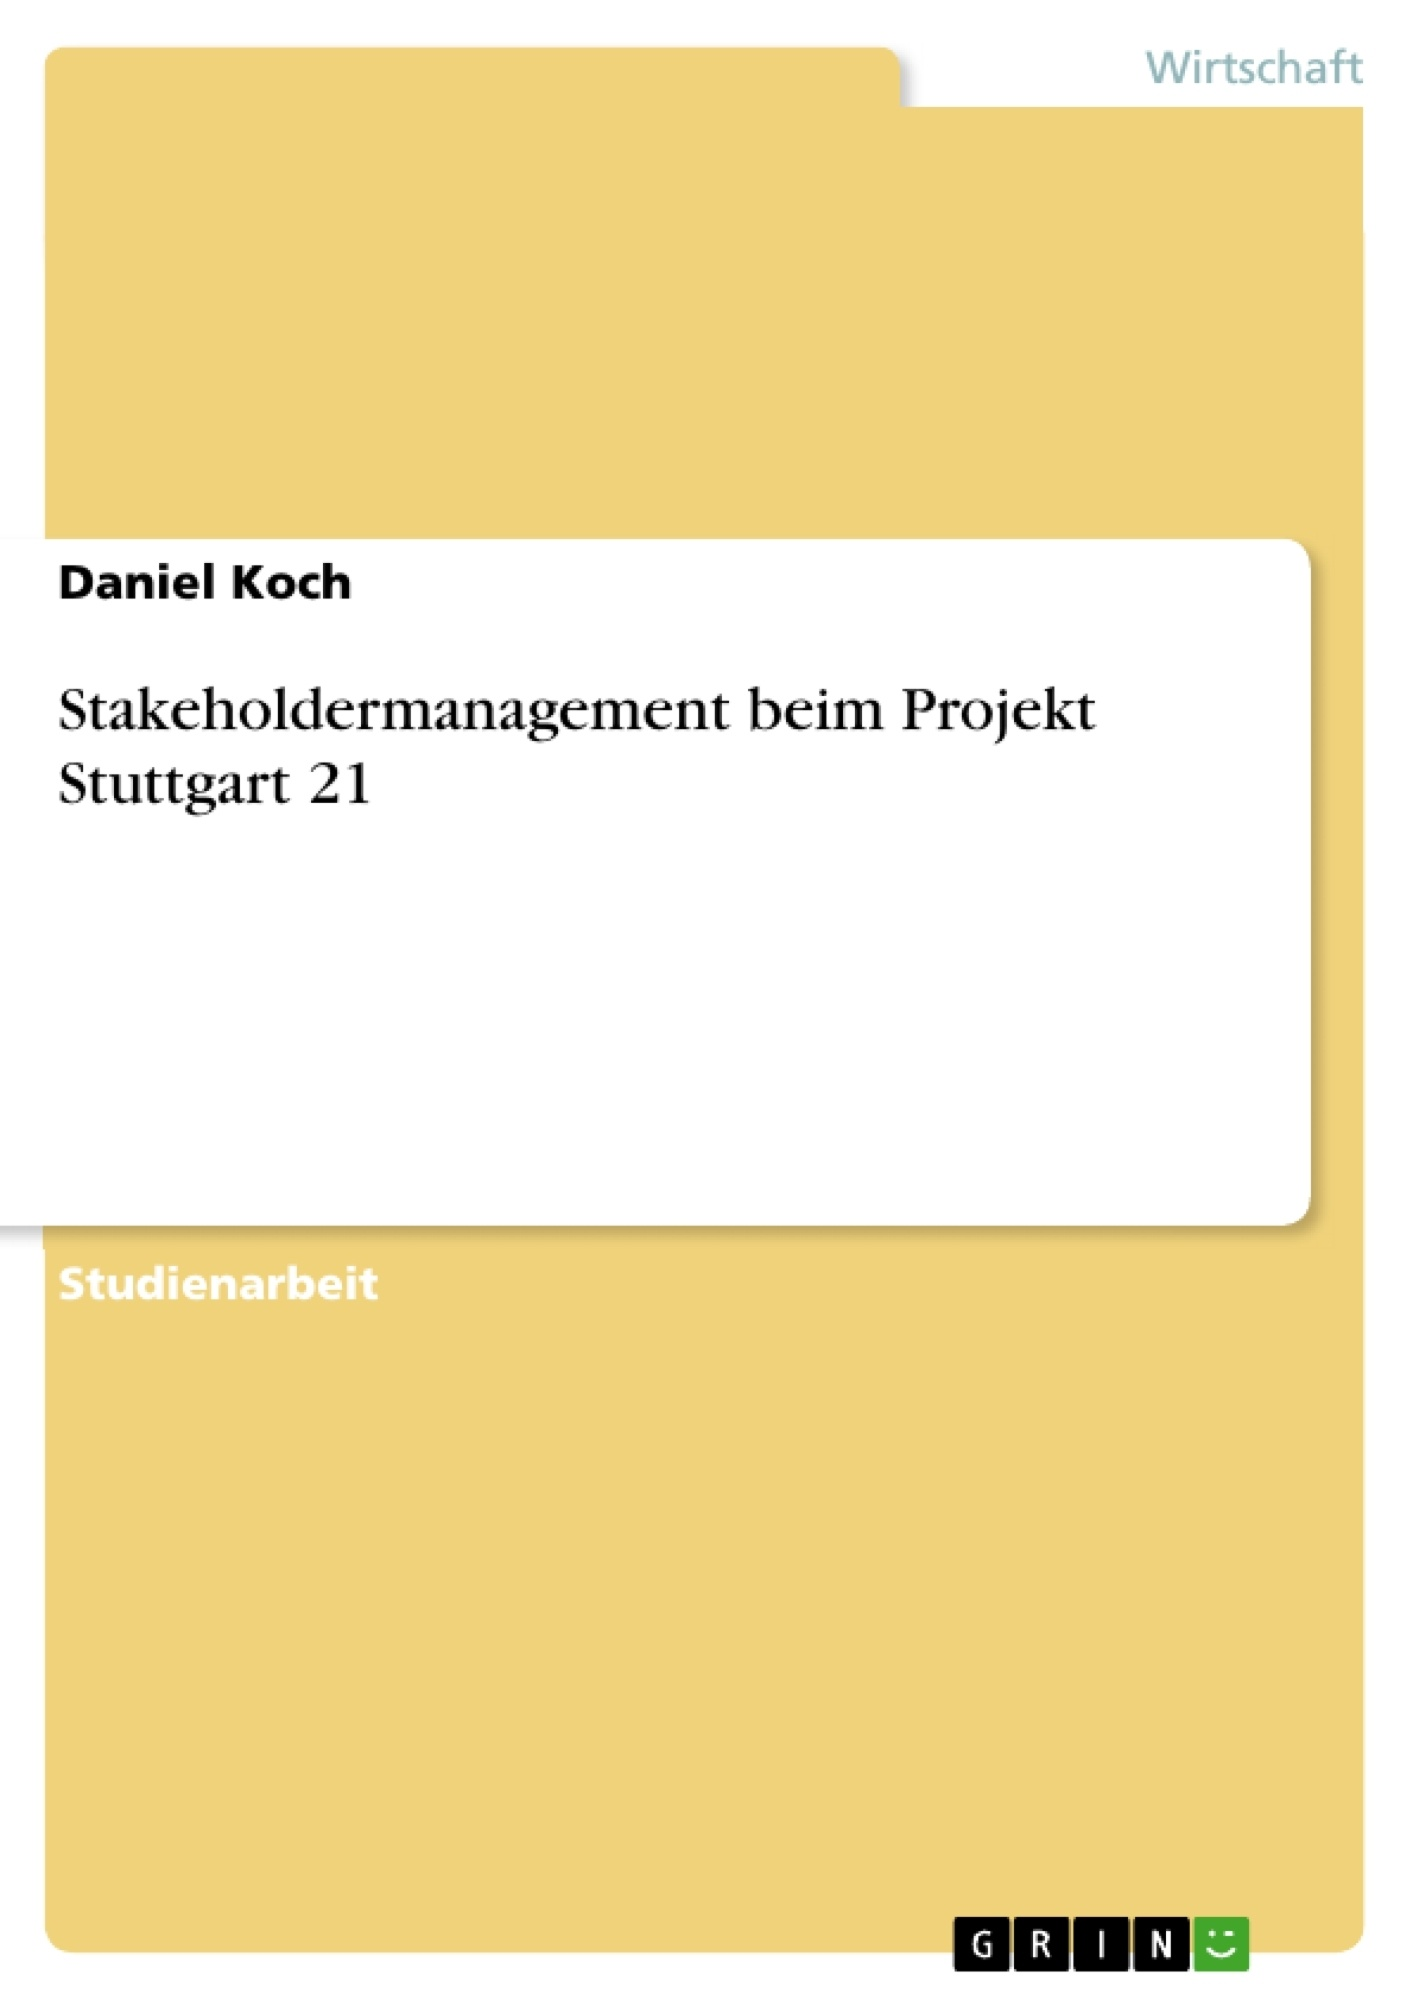 Titel: Stakeholdermanagement beim Projekt Stuttgart 21